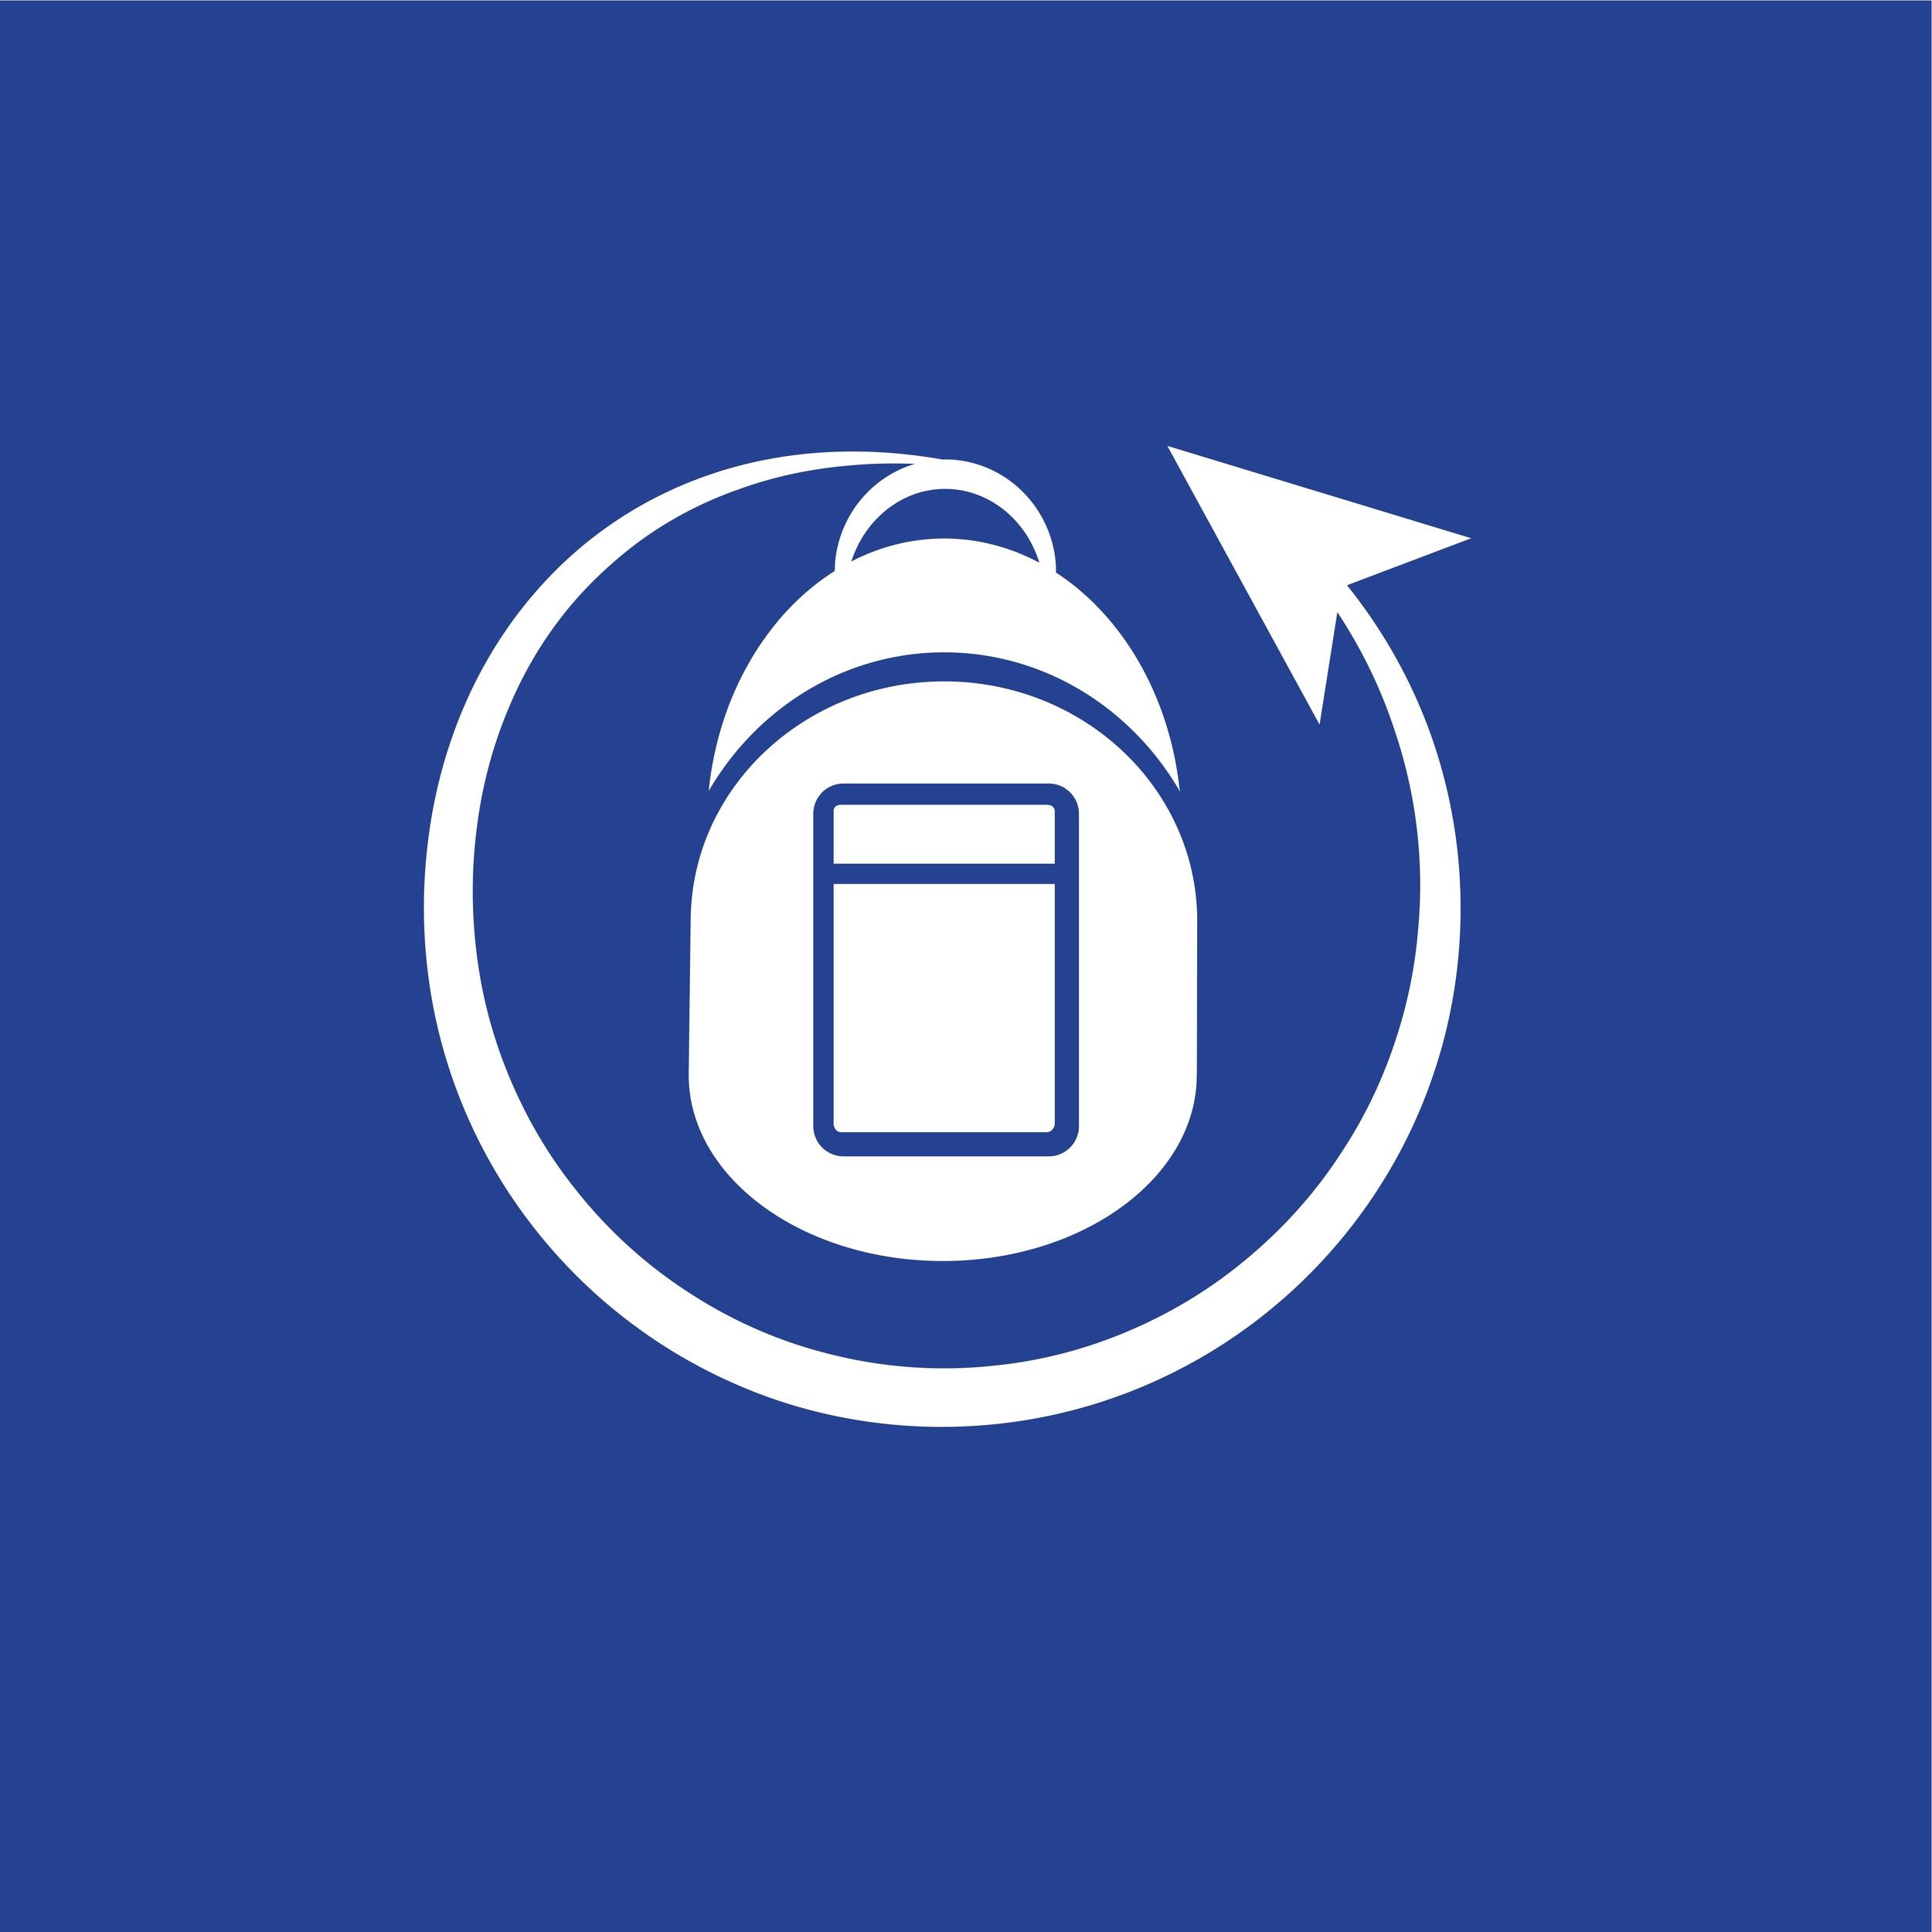 GivingBackpacks Emblem Blue.jpg